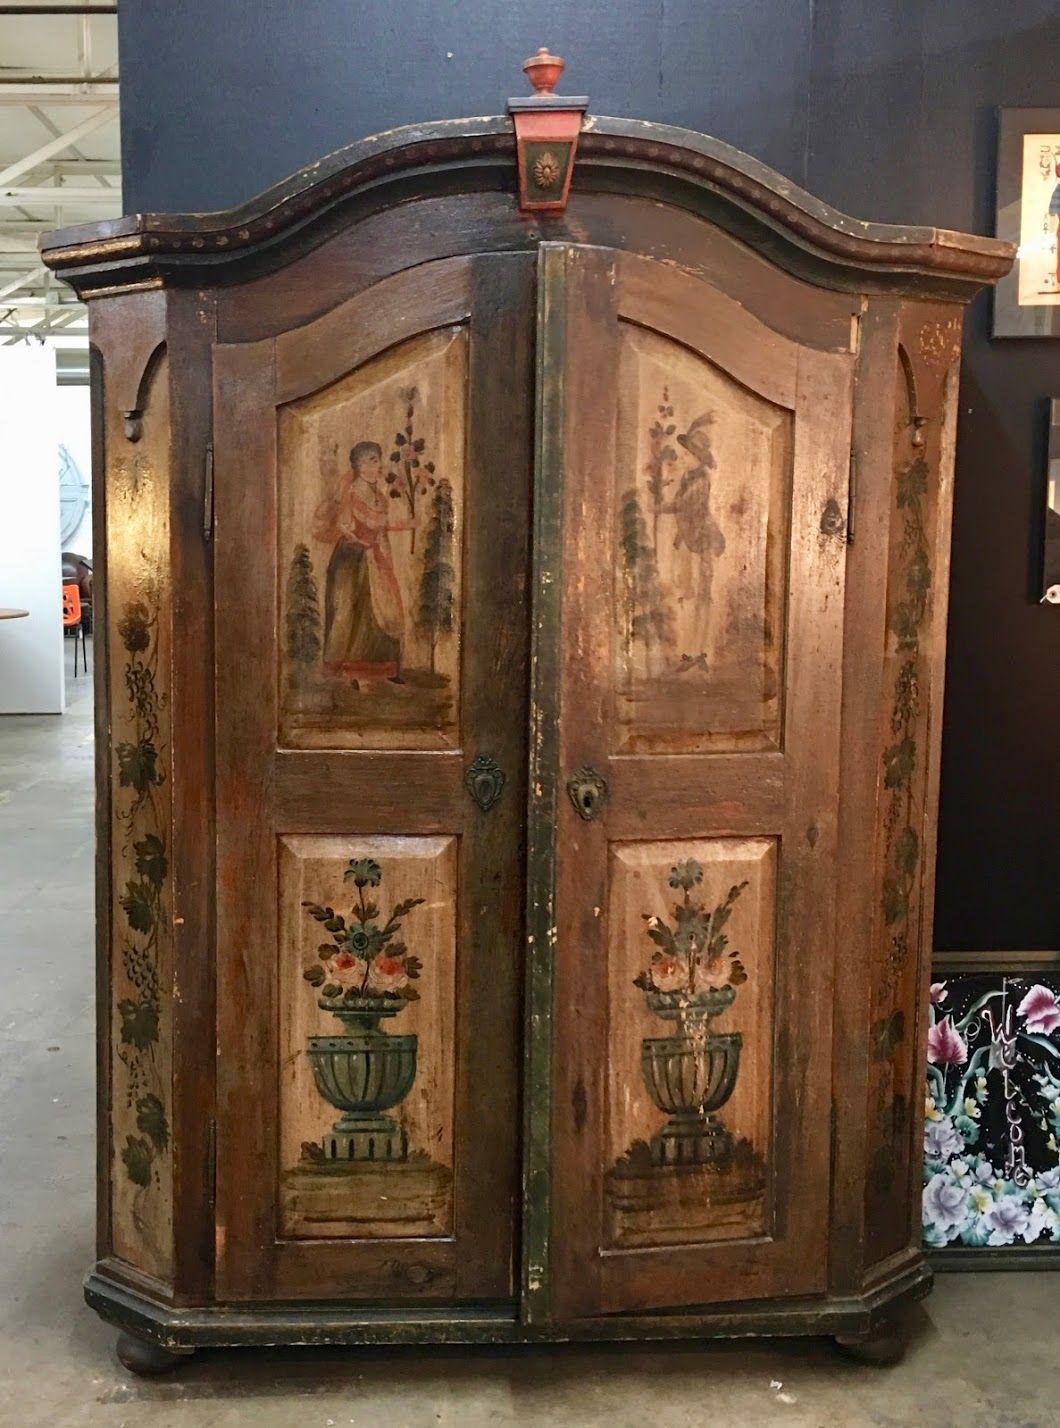 Antique German Hand Painted Wardrobe 64  Wide x 23  Deep x 80  High. Antique German Hand Painted Wardrobe 64  Wide x 23  Deep x 80